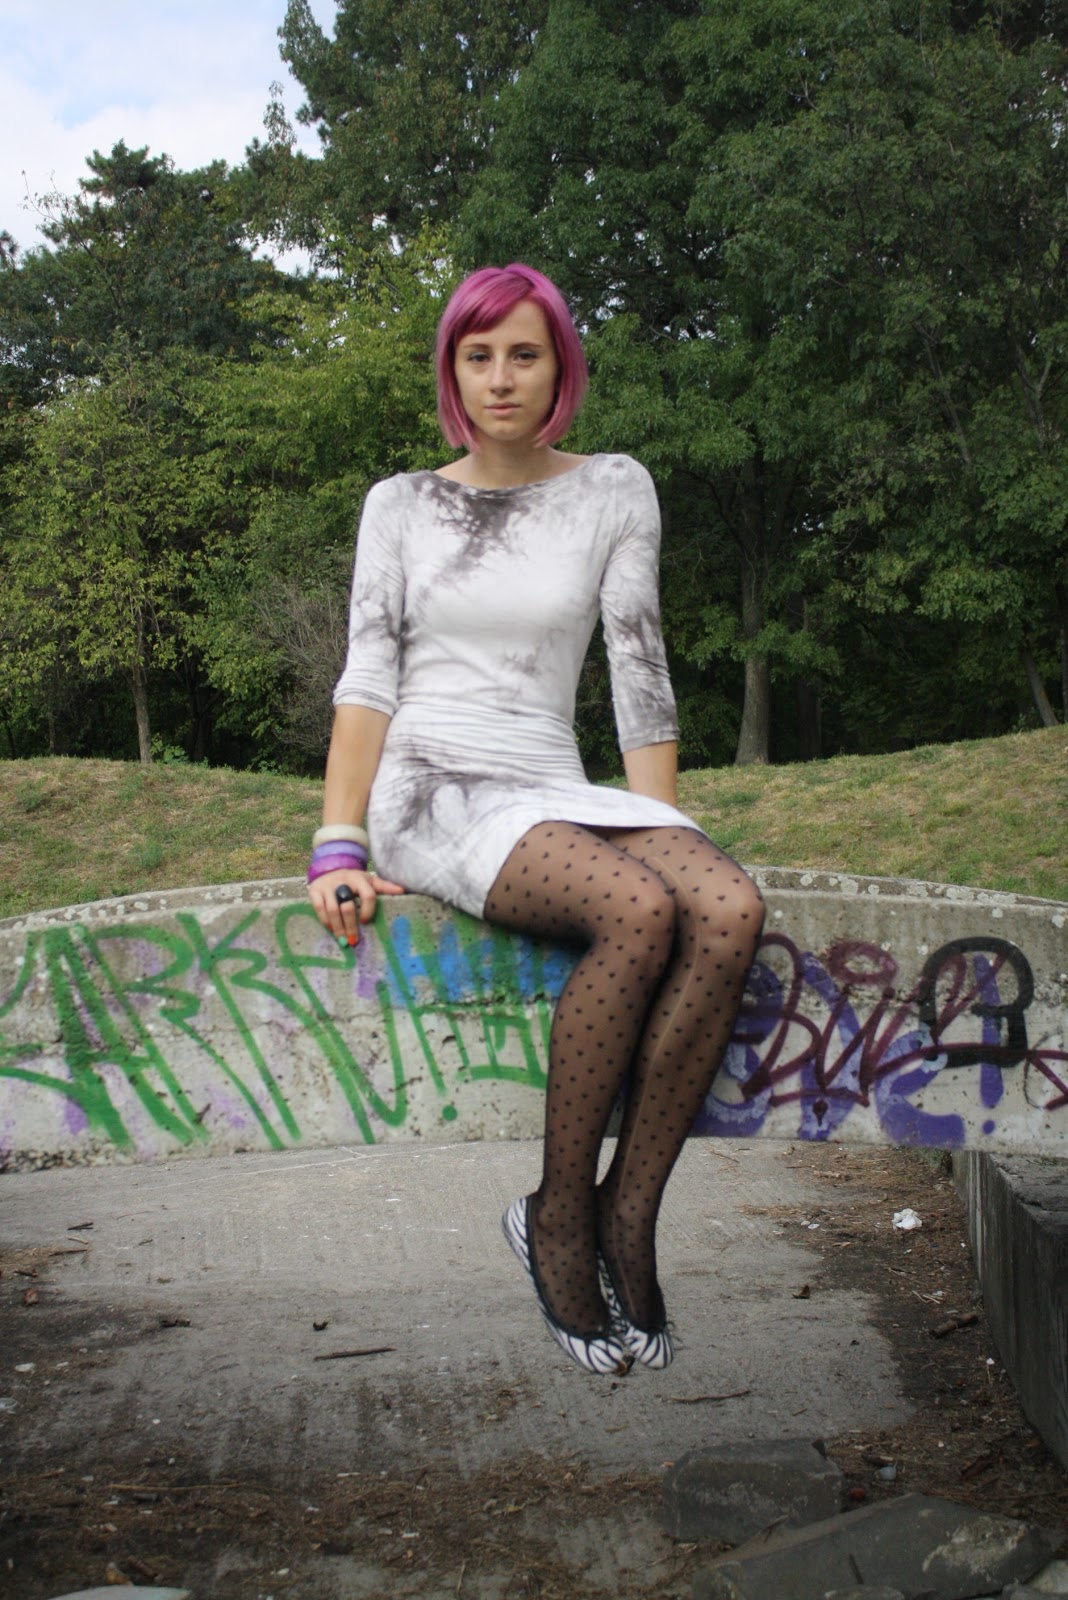 pantyhose pics Punk